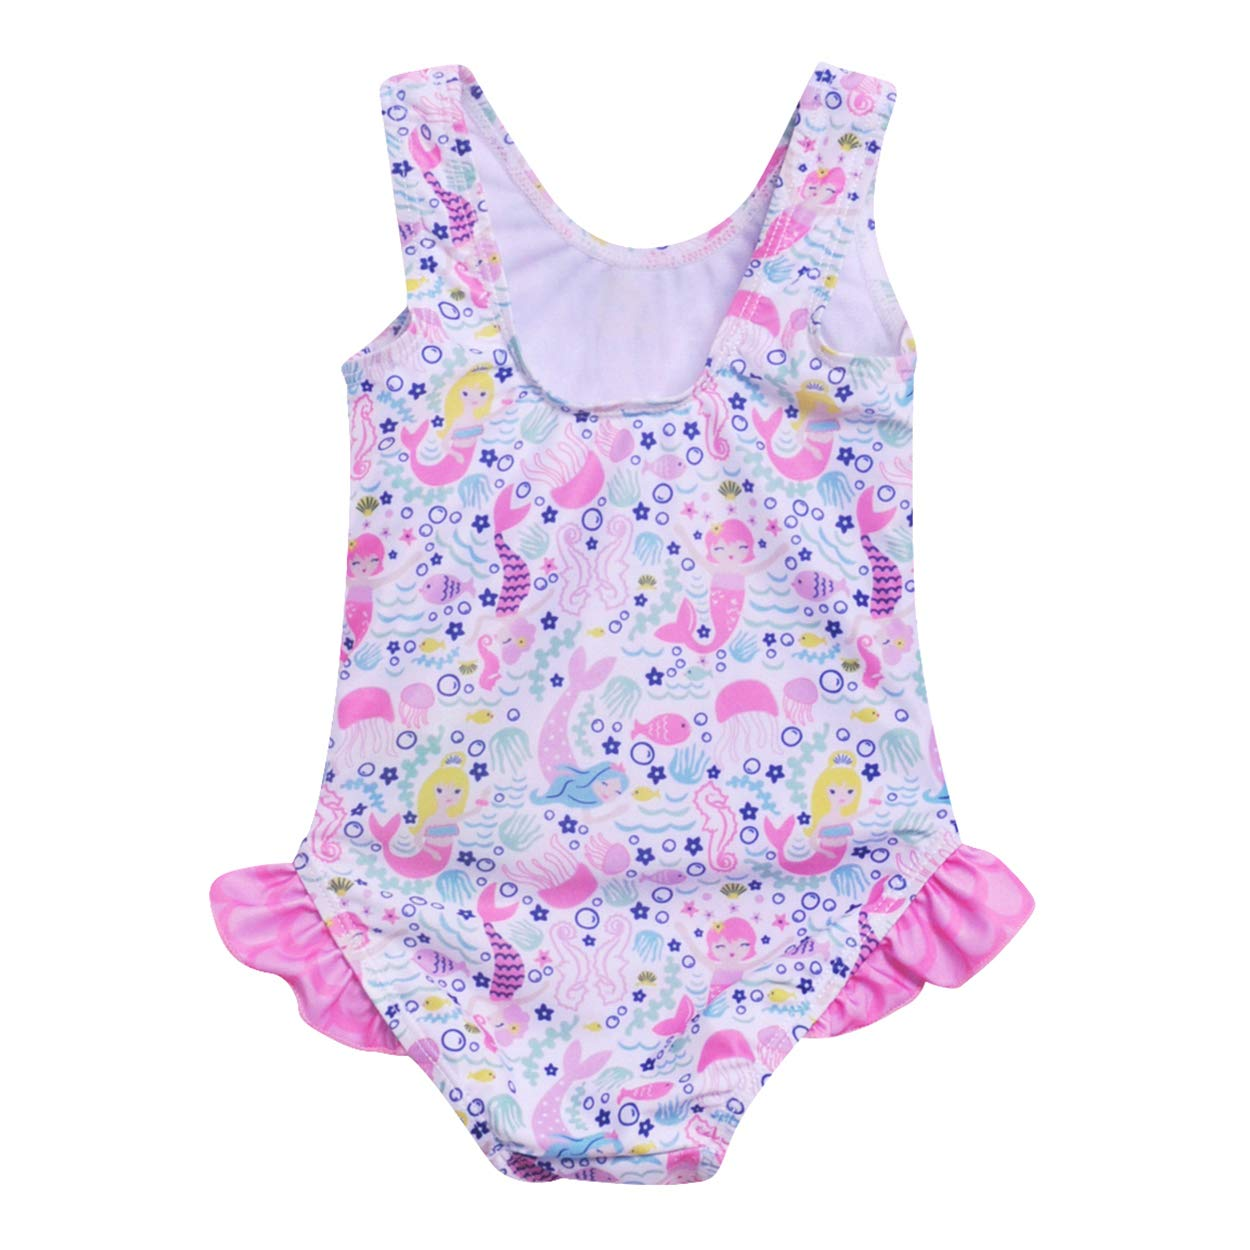 Flap Happy Baby Girls UPF 50 Delaney Hip Ruffle Swimsuit